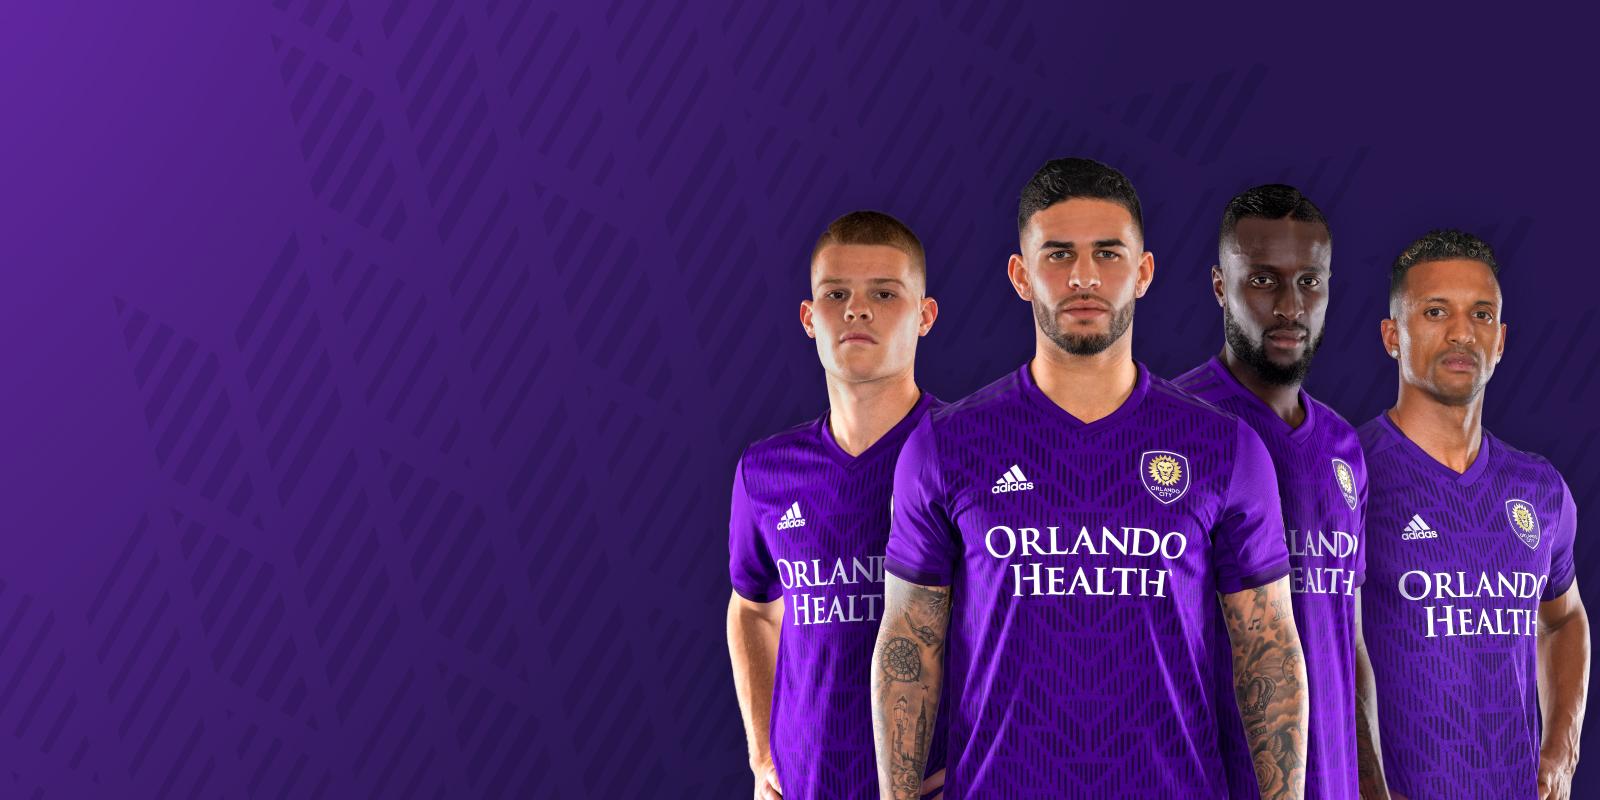 Orlando City Soccer Club players